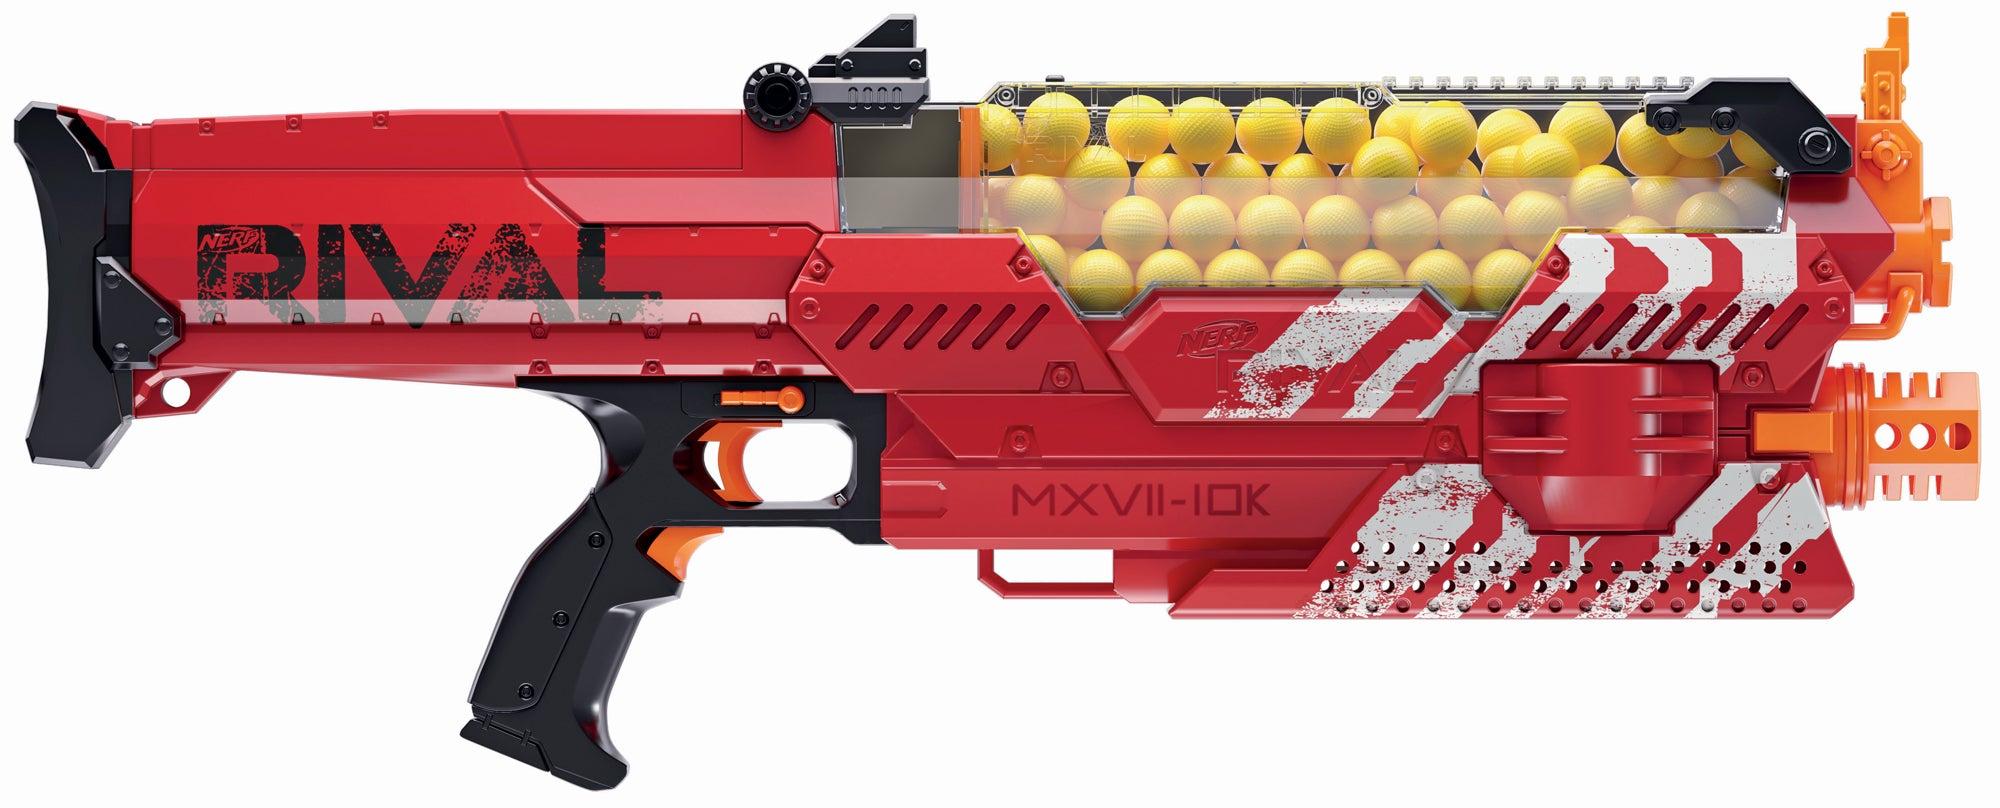 elet nerf gu | New Nerf gun packs camera